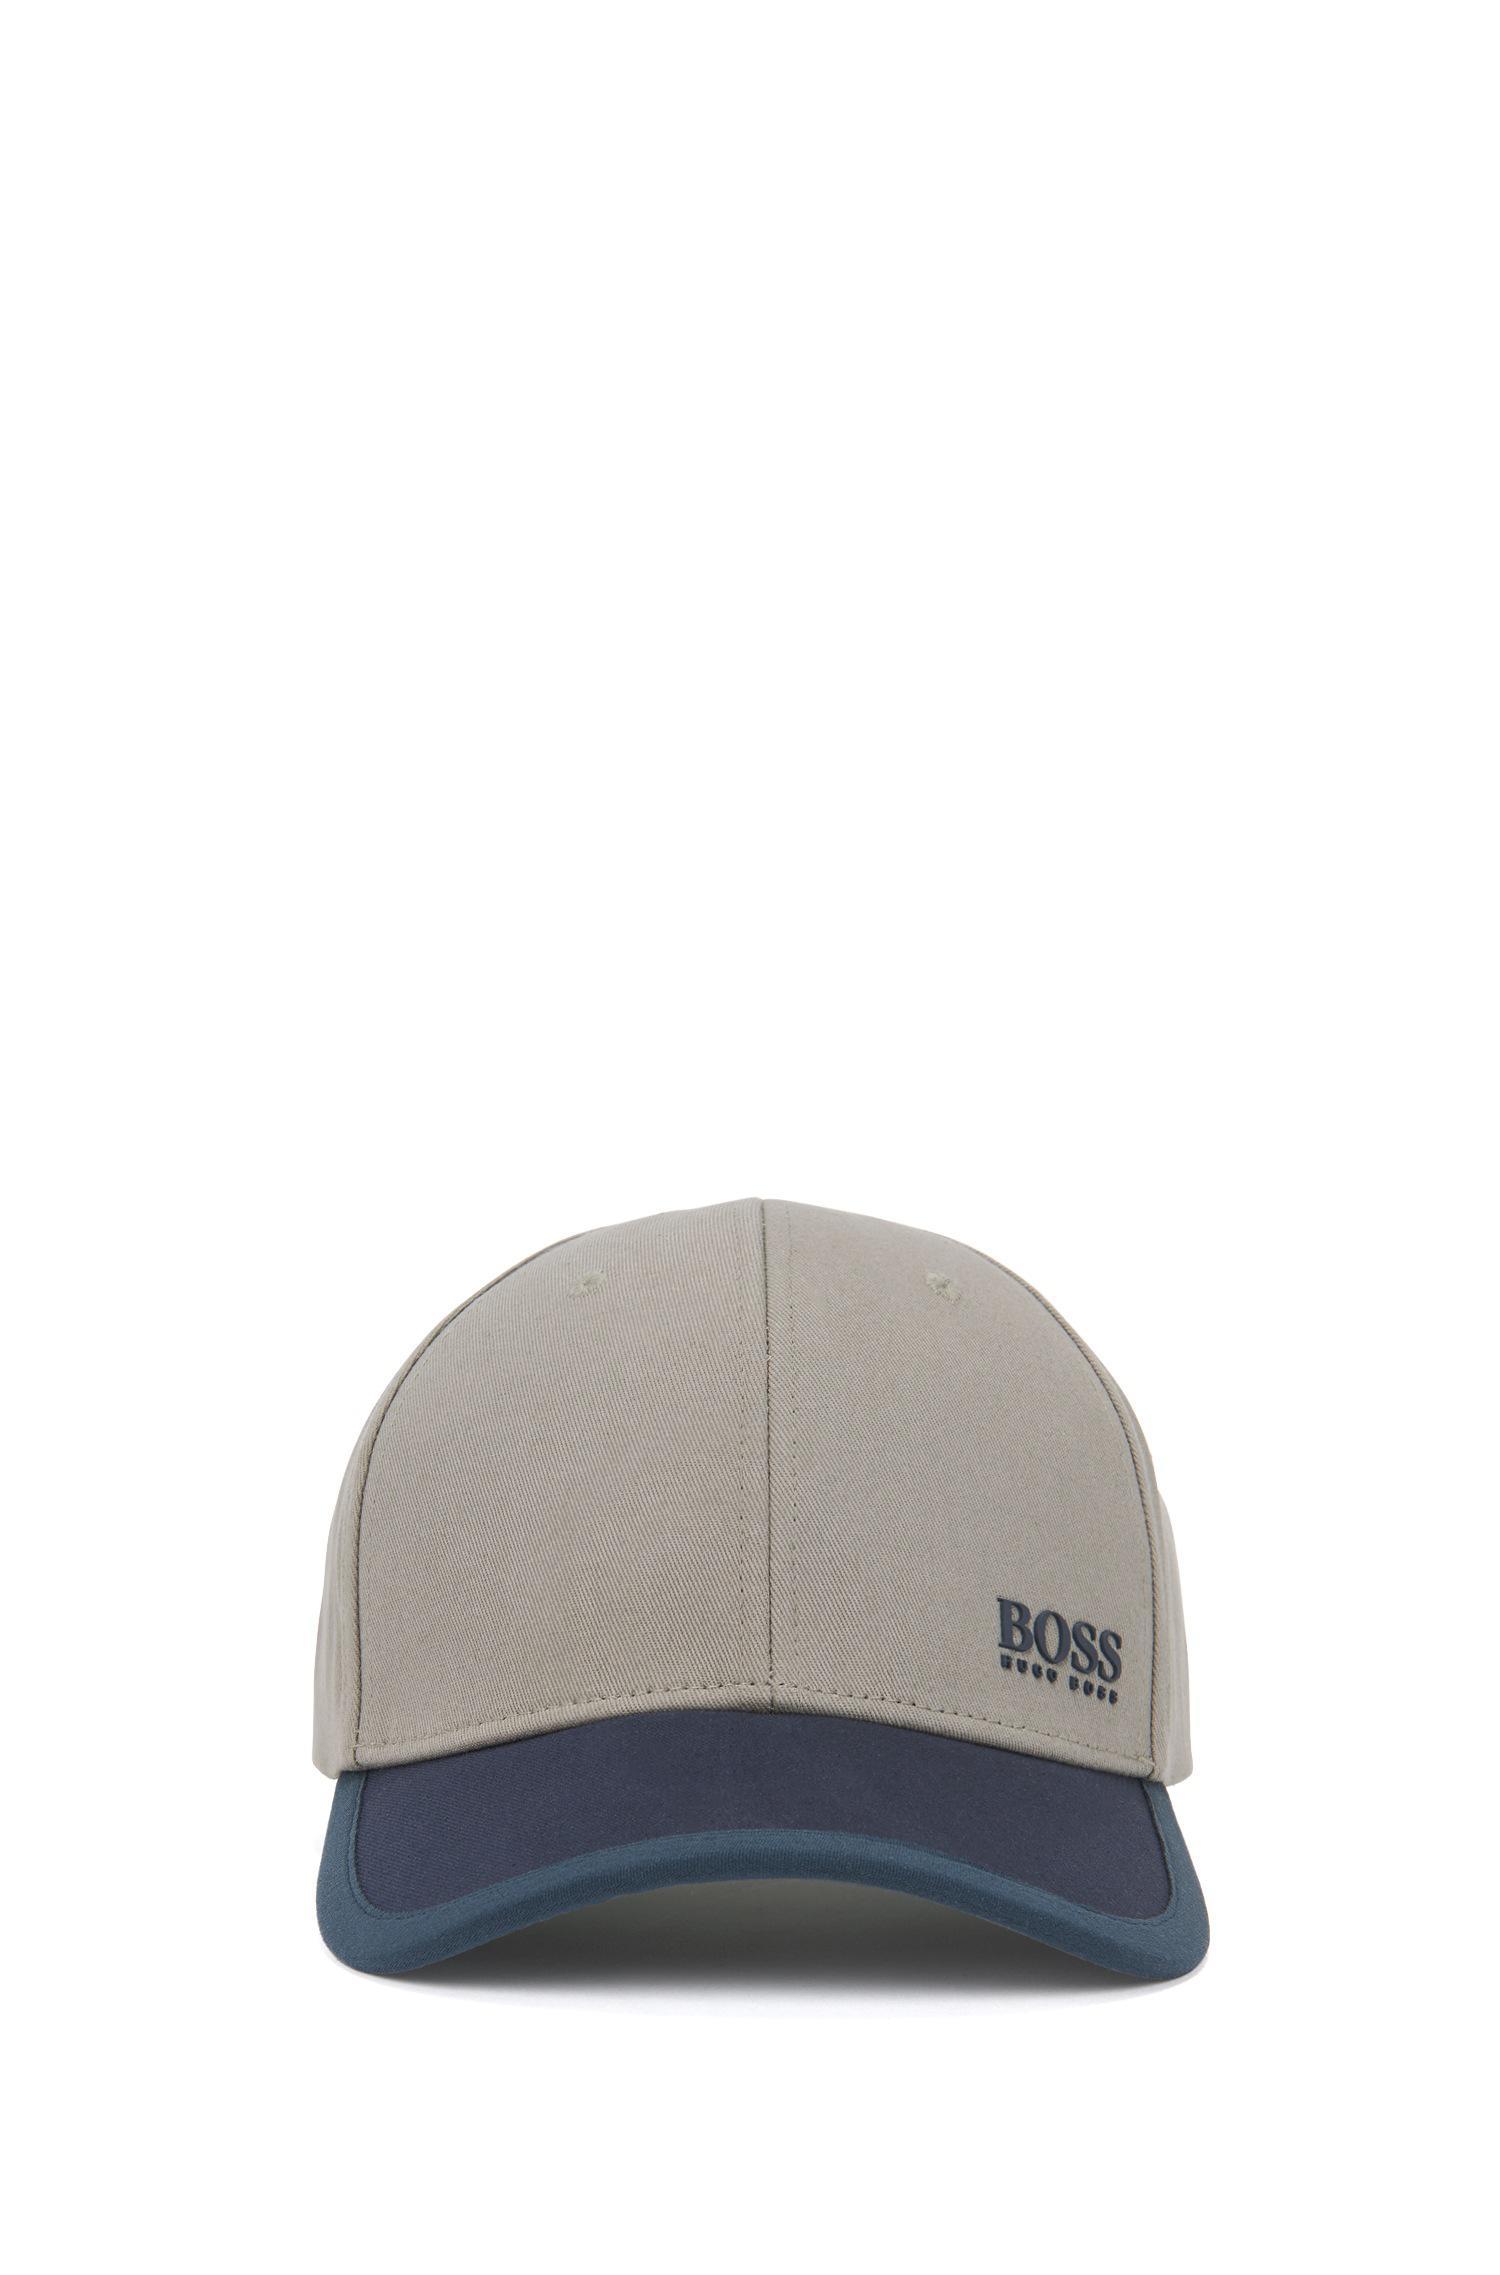 51b796de6be Boss Colour-block Baseball Cap In Cotton Twill in Natural for Men - Lyst